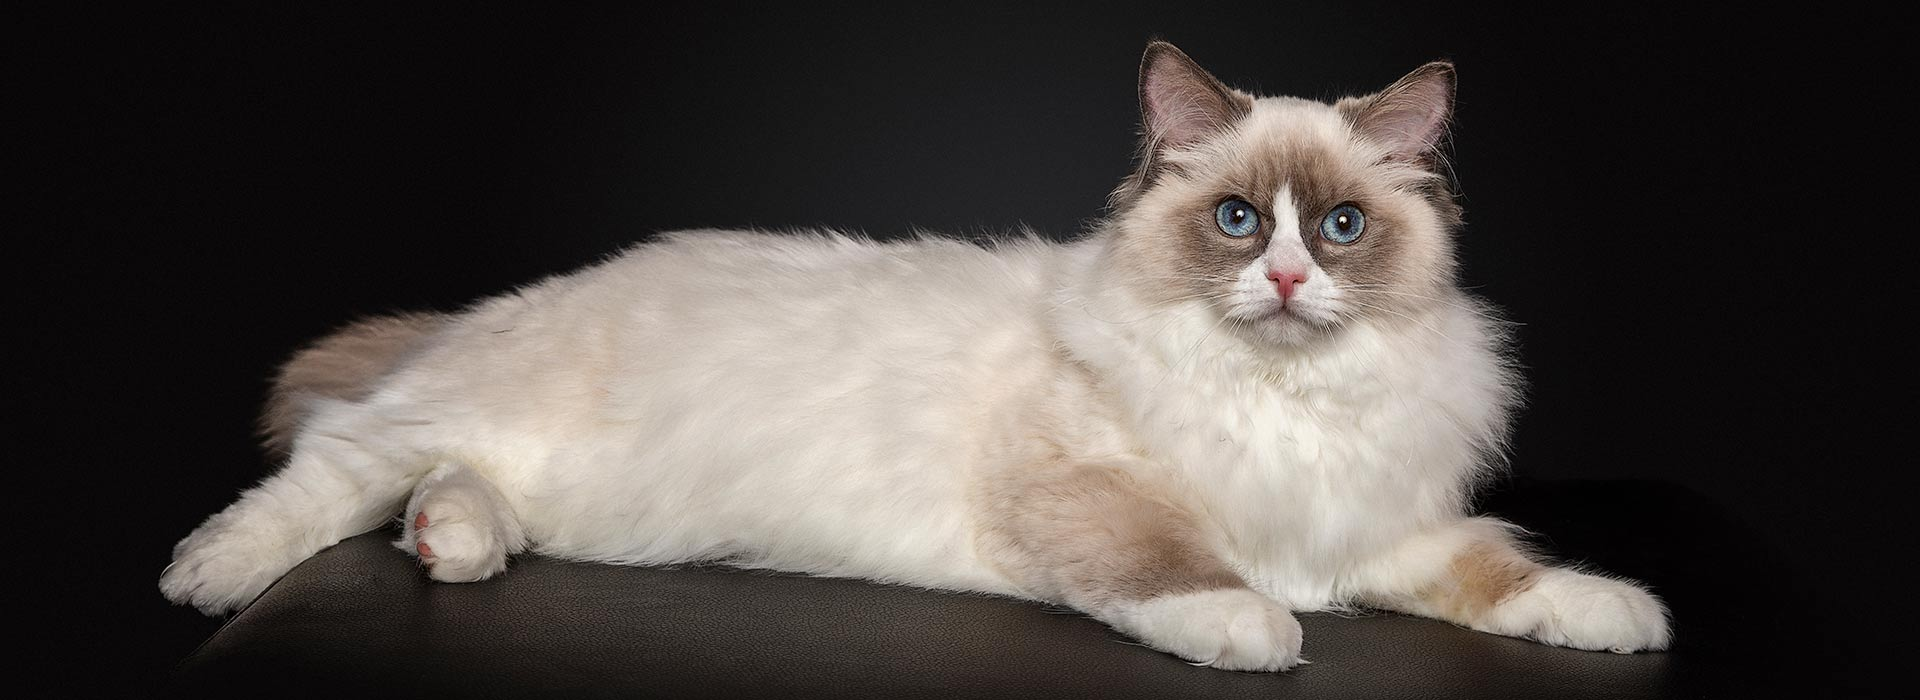 Ragdoll Cat Photography